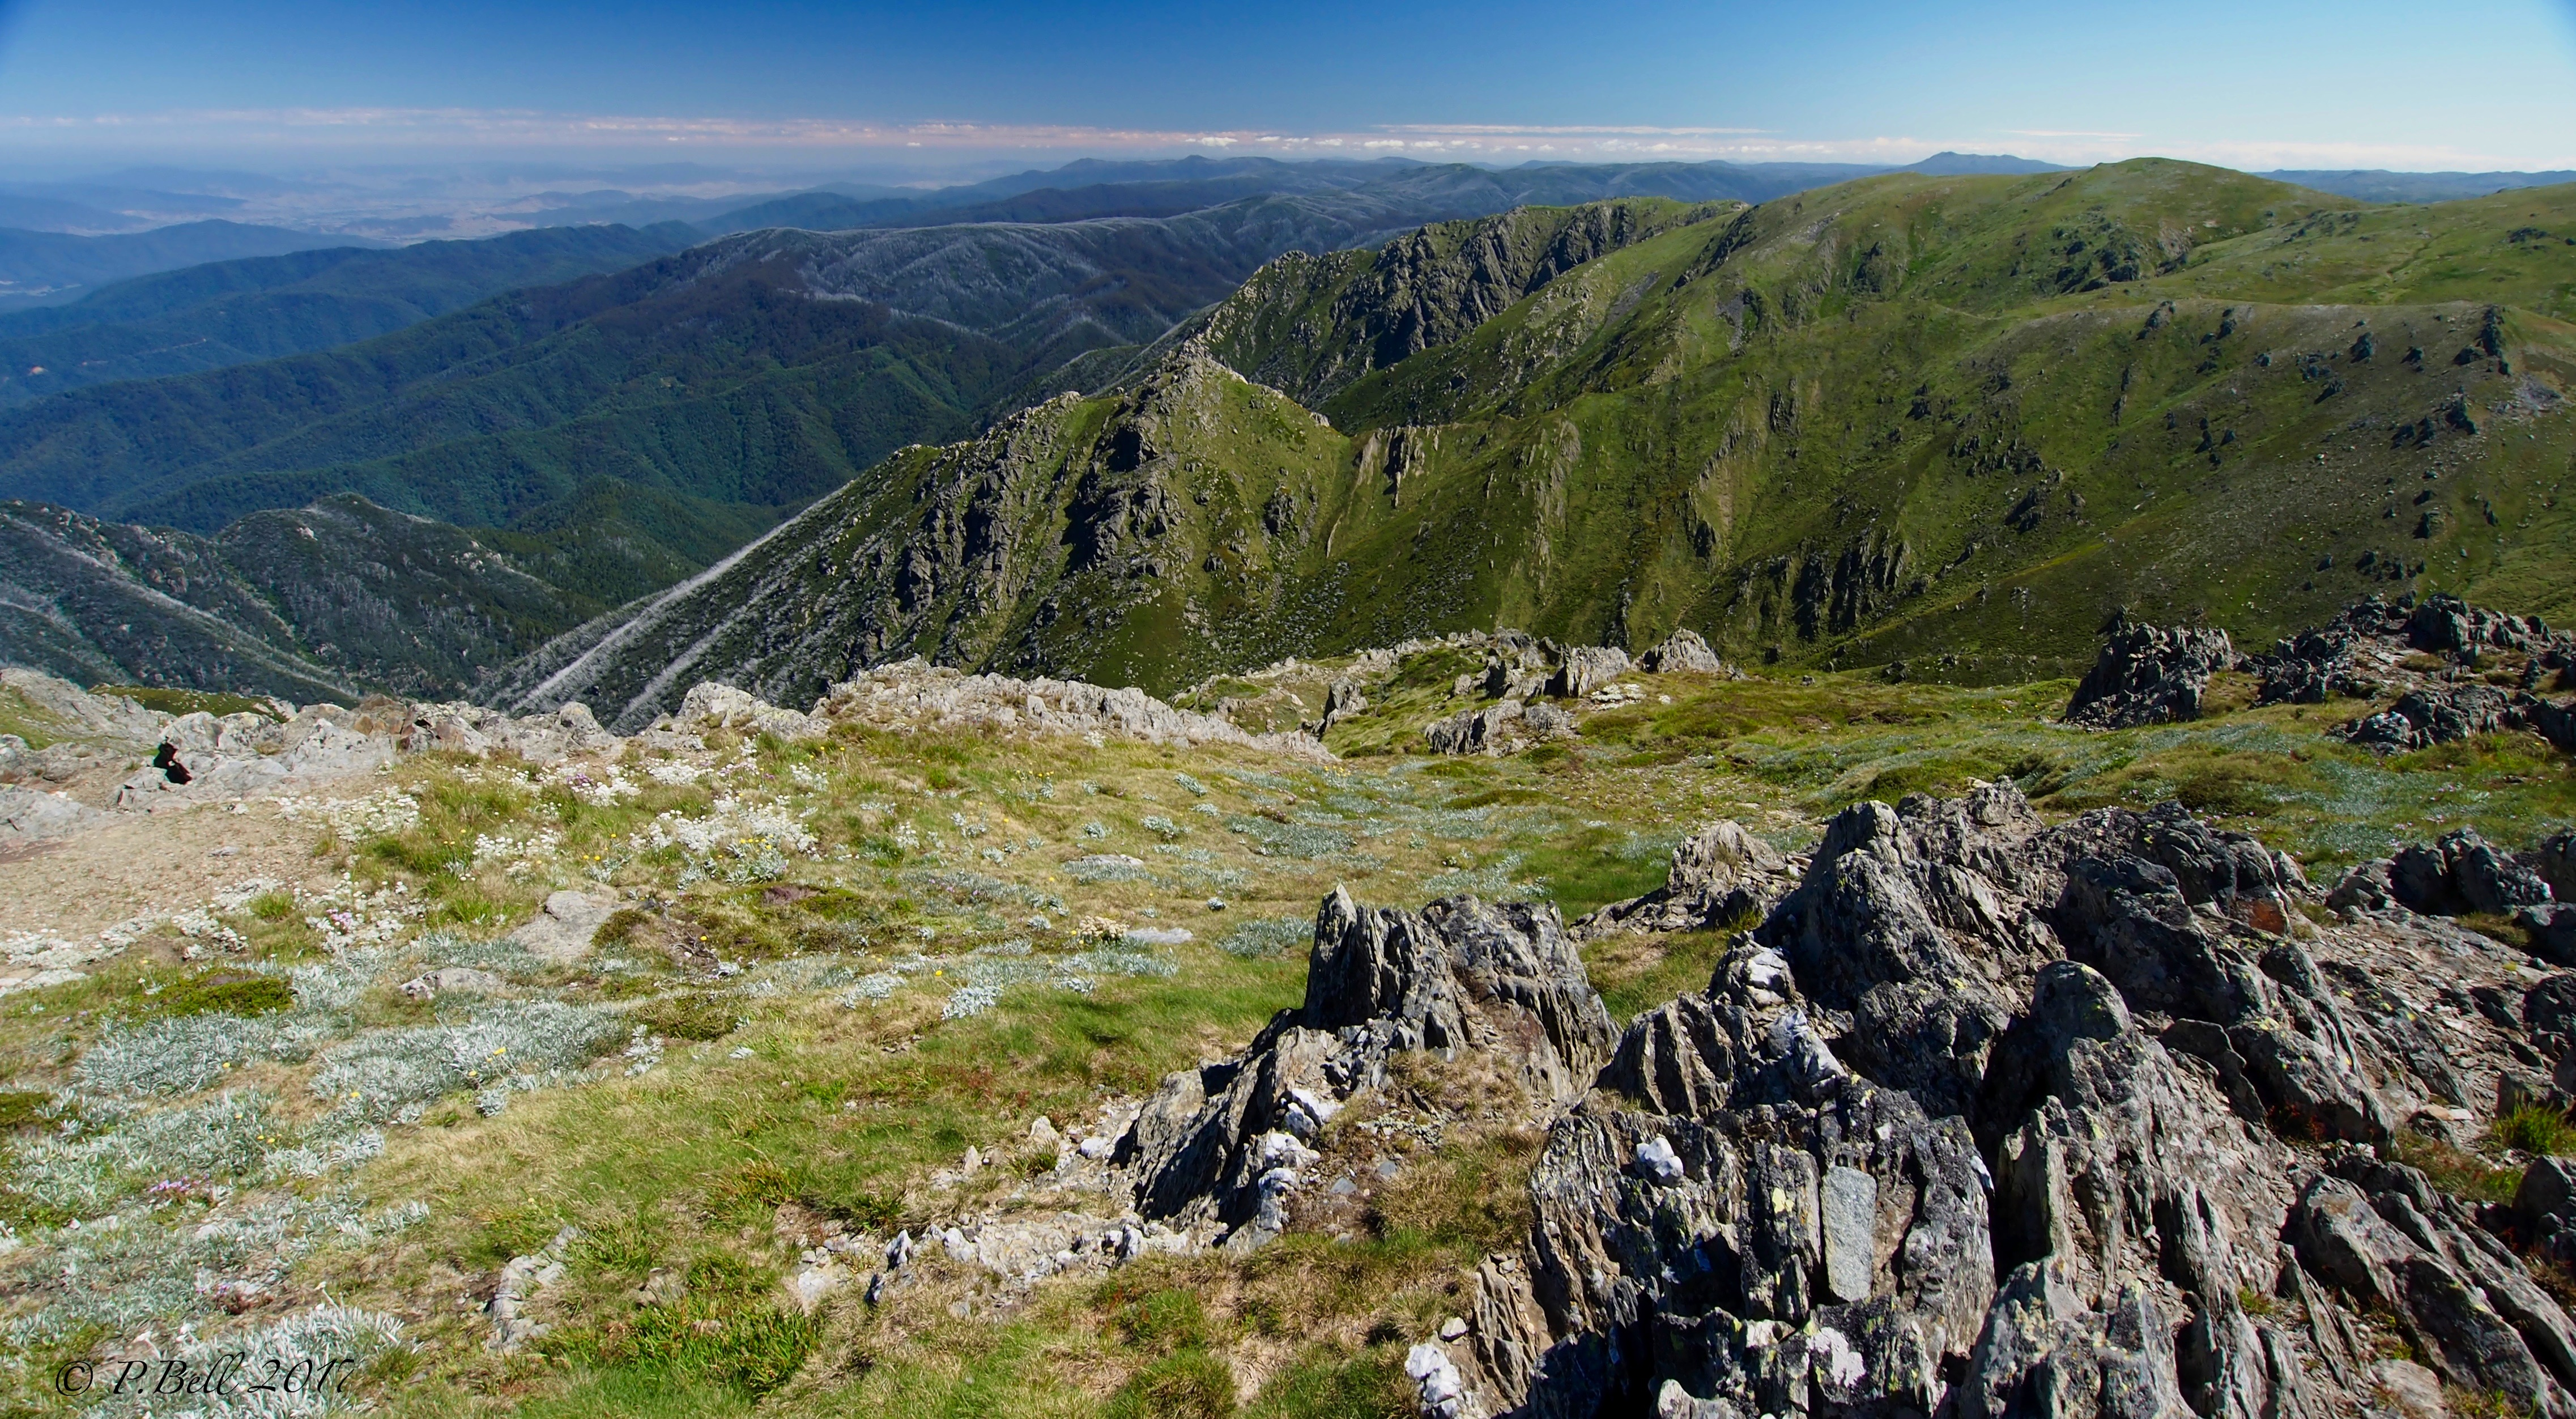 Kosciuszko National Park, Snowy Mountains in Summer